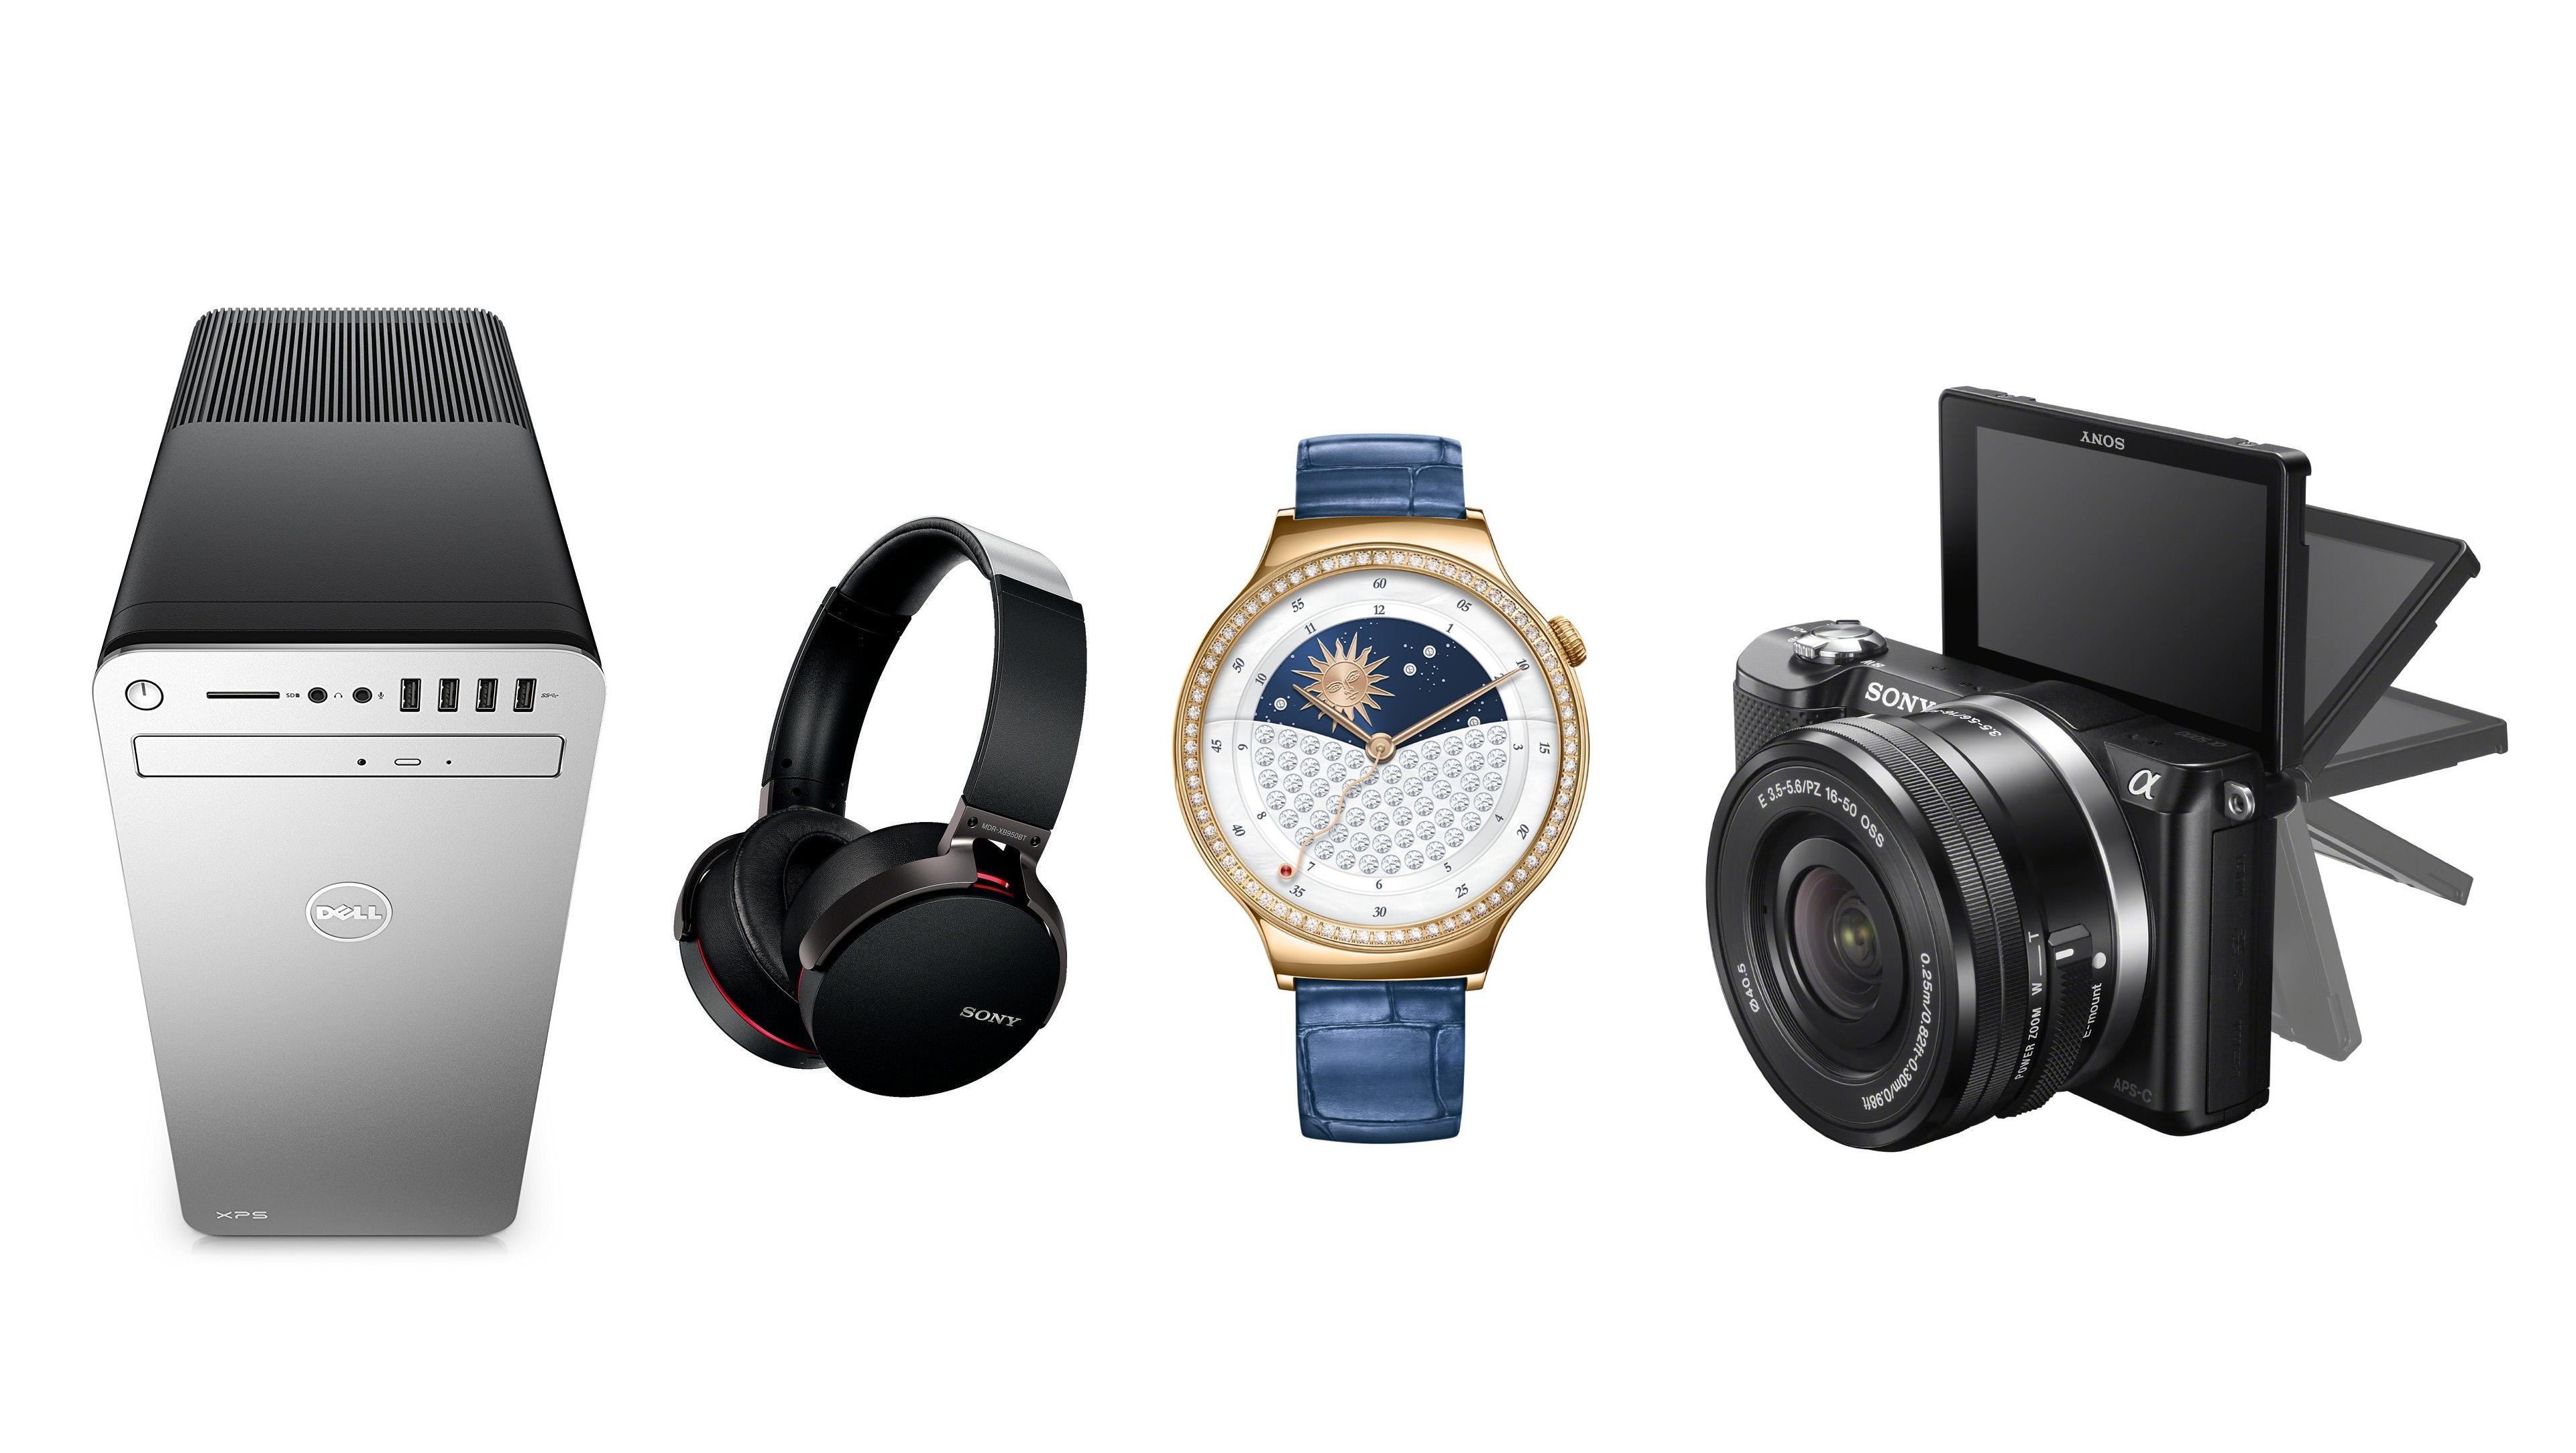 cyber monday deals, amazon cyber monday, electronics deals, tech deals, tech gifts, cyber monday electronics deals